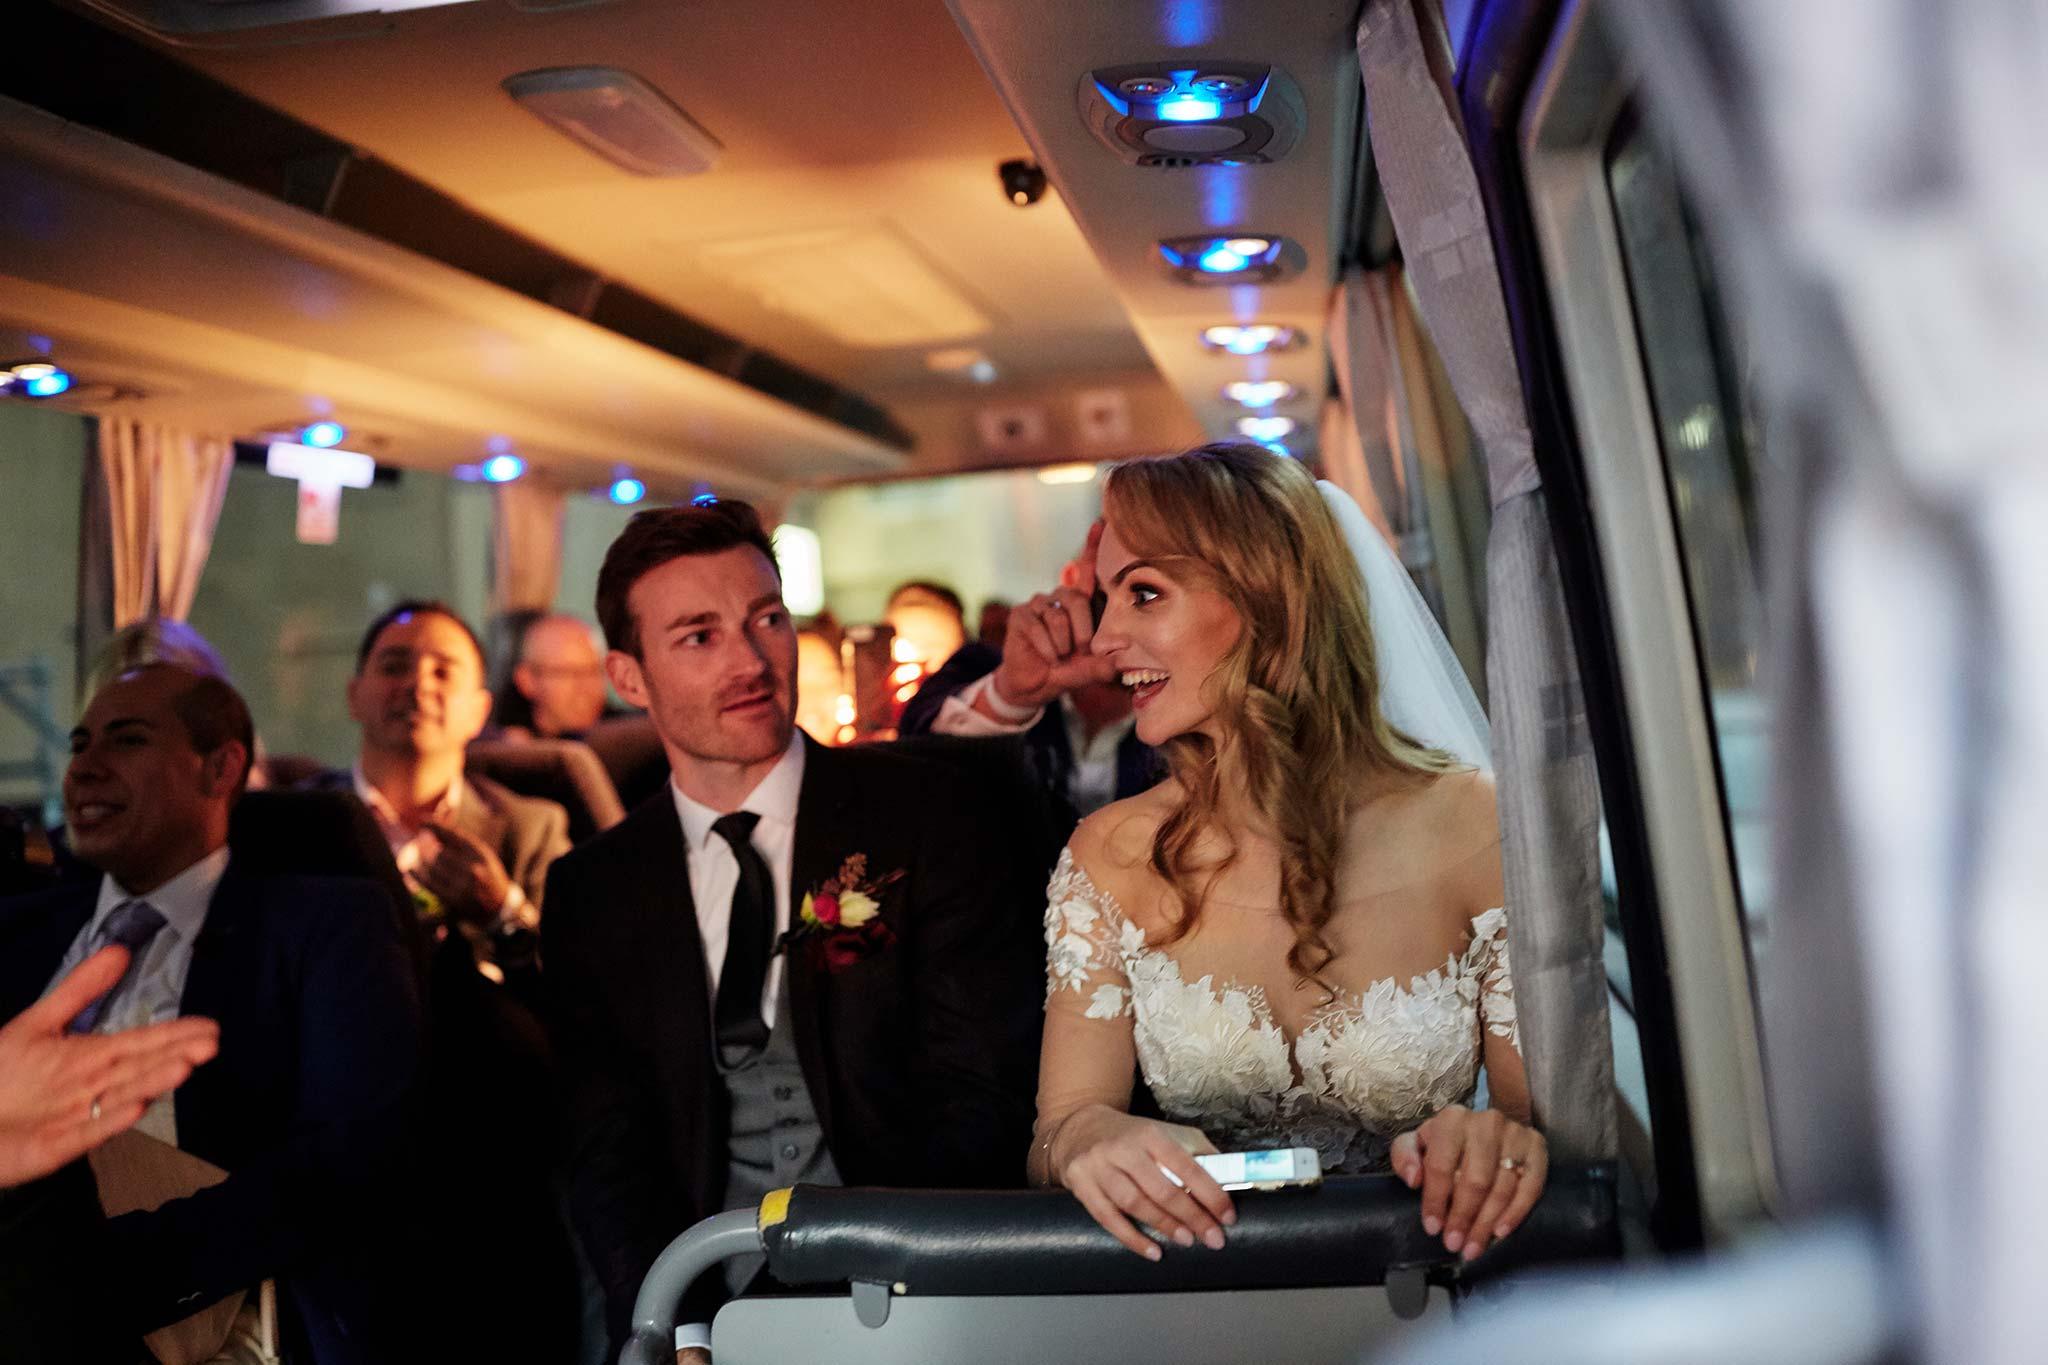 Melbourne-tour-bus-wedding-bride-groom